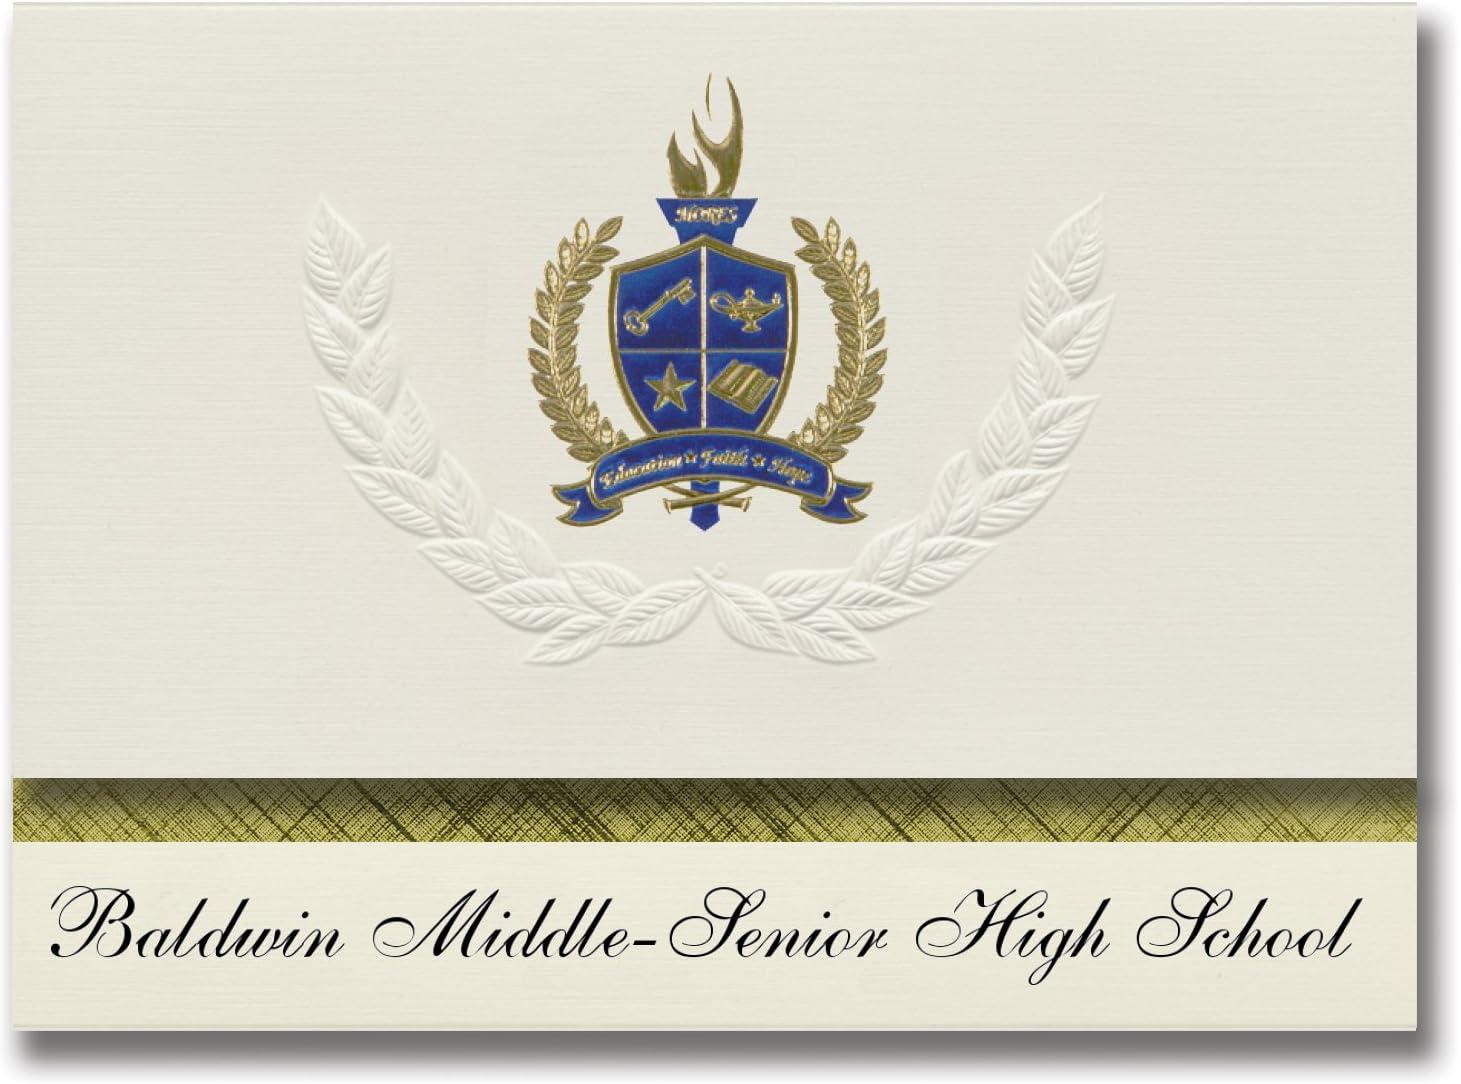 Signature Announcements Baldwin Middle-Senior High School (Baldwin, FL) Graduation Announcements, Presidential style, Elite package of 25 with Gold & Blue Metallic Foil seal